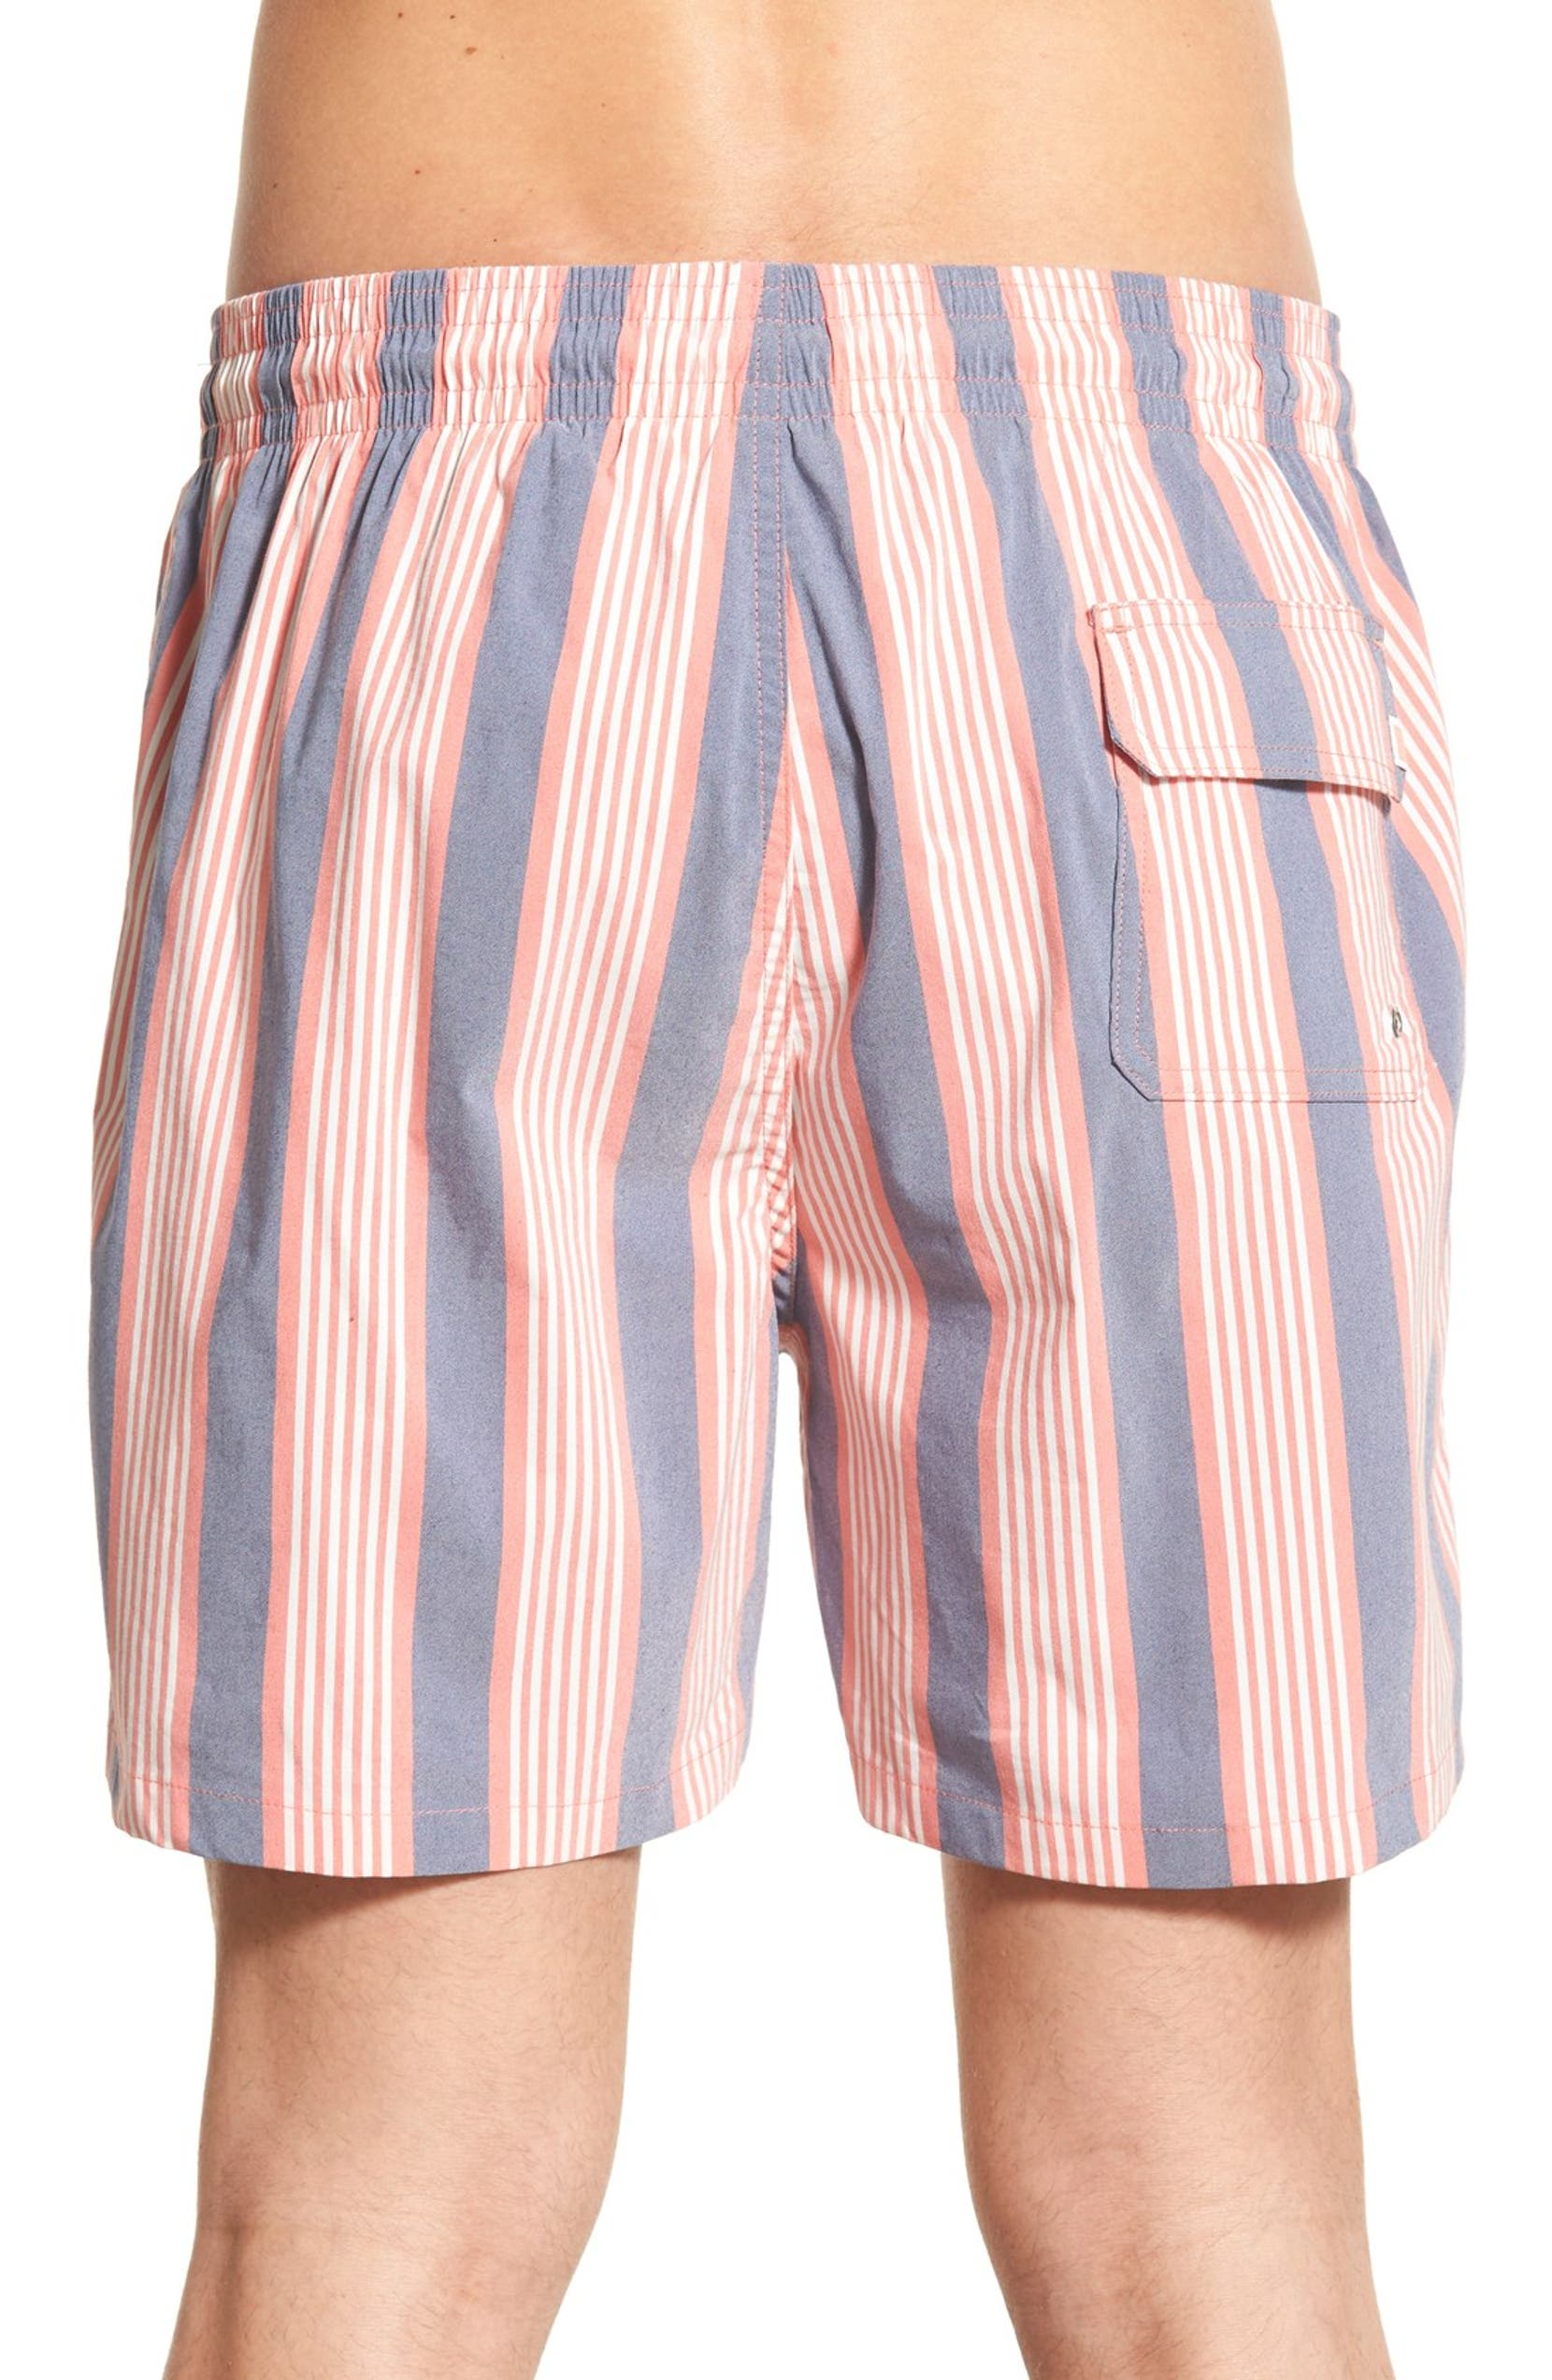 2e779ca289 Solid & Striped 'Classic Stripe' Swim Trunks   Nordstrom